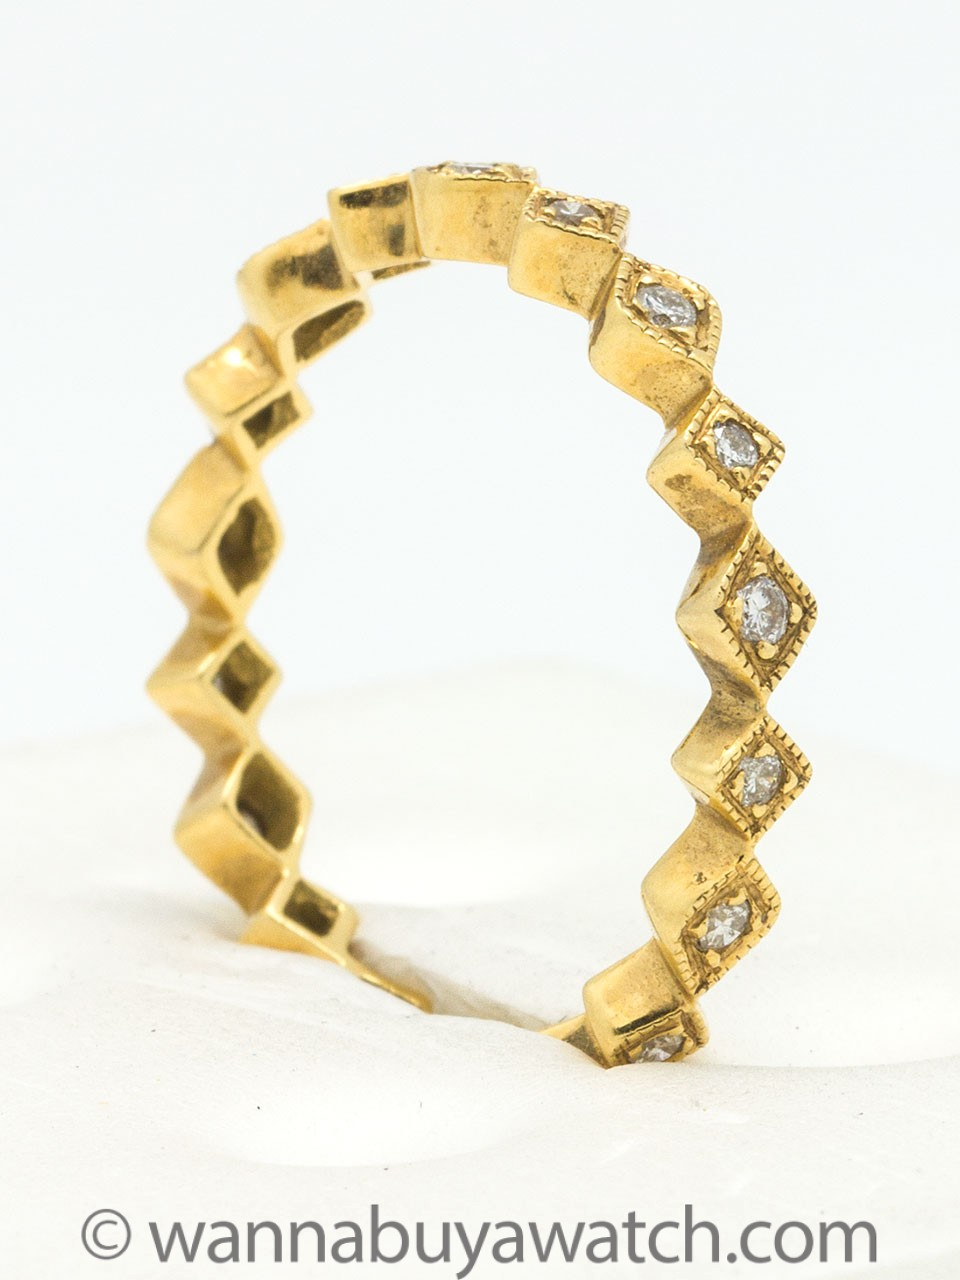 18K Yellow Gold with Diamonds